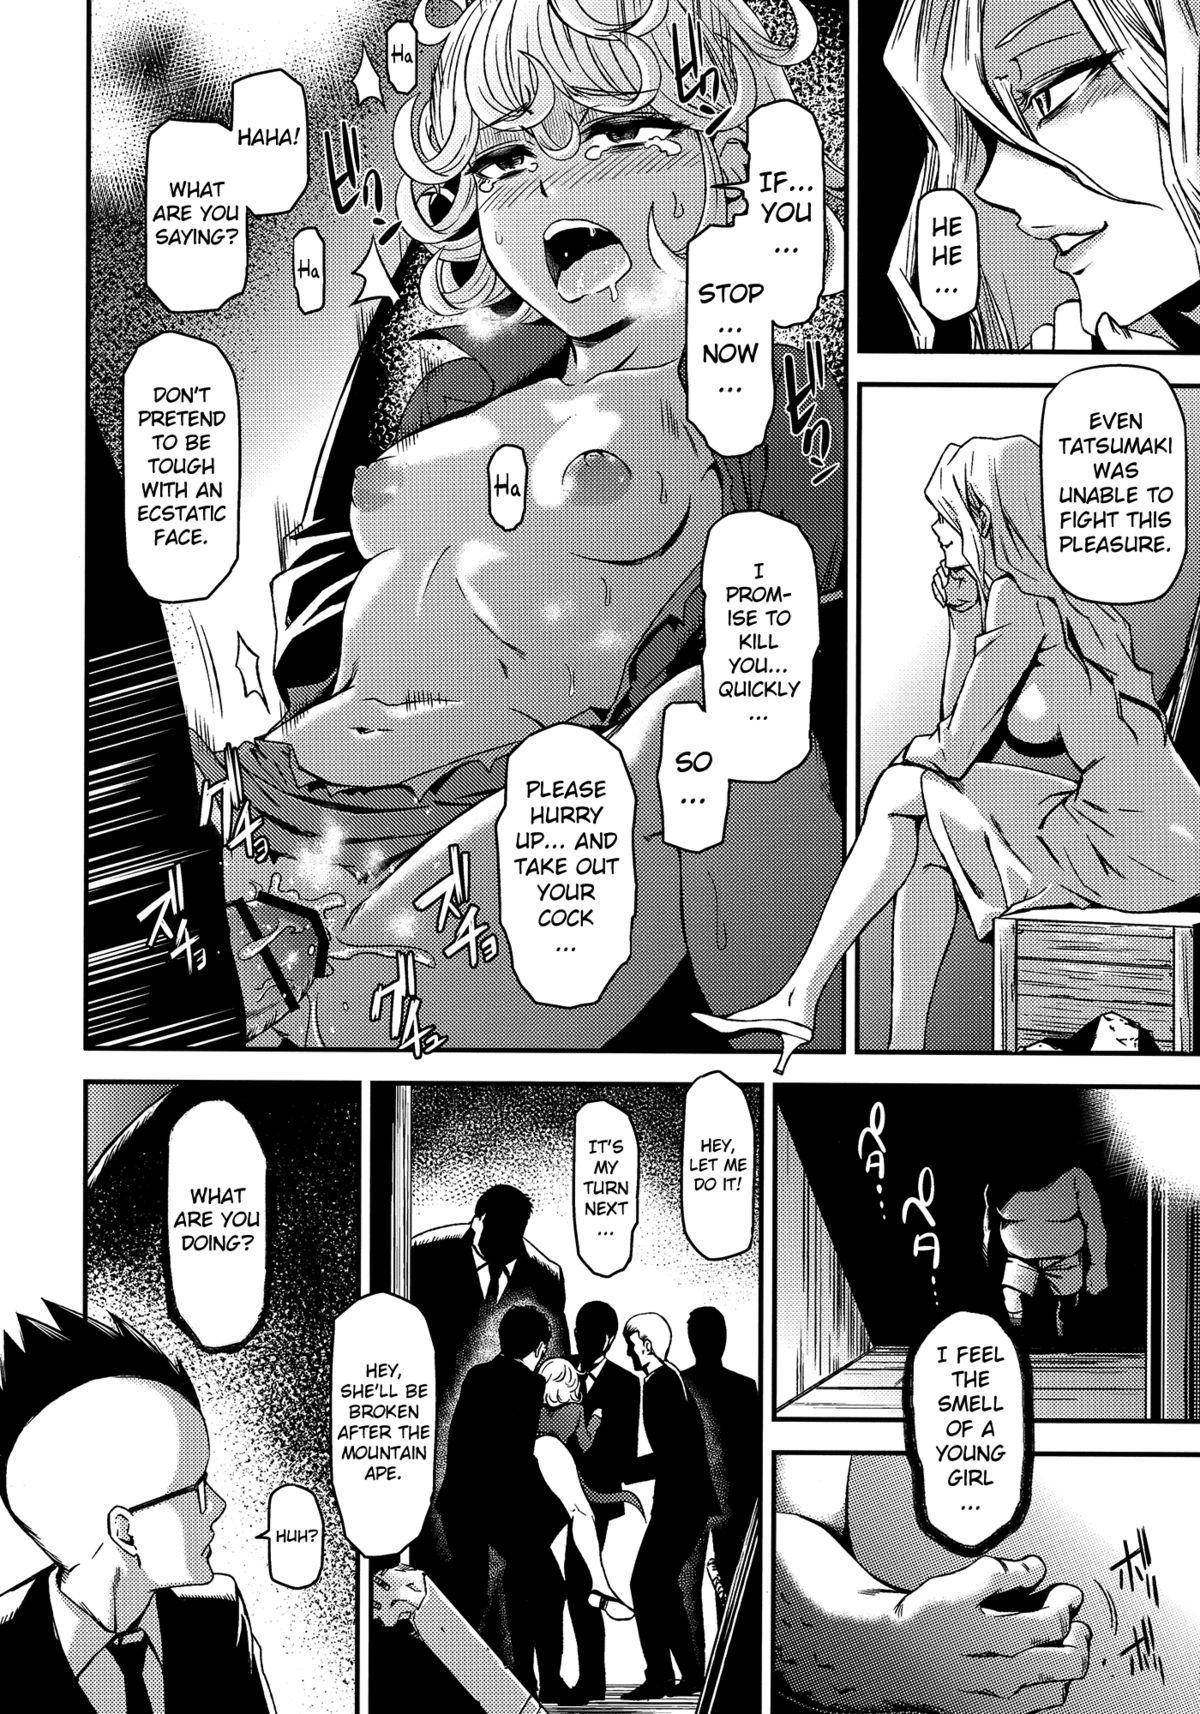 (C89) [Kiyosumi Hurricane (Kiyosumi Hurricane)] ONE-HURRICANE - Kutsujoku no Tatsumaki (One Punch Man) [English] [MintVoid] 12